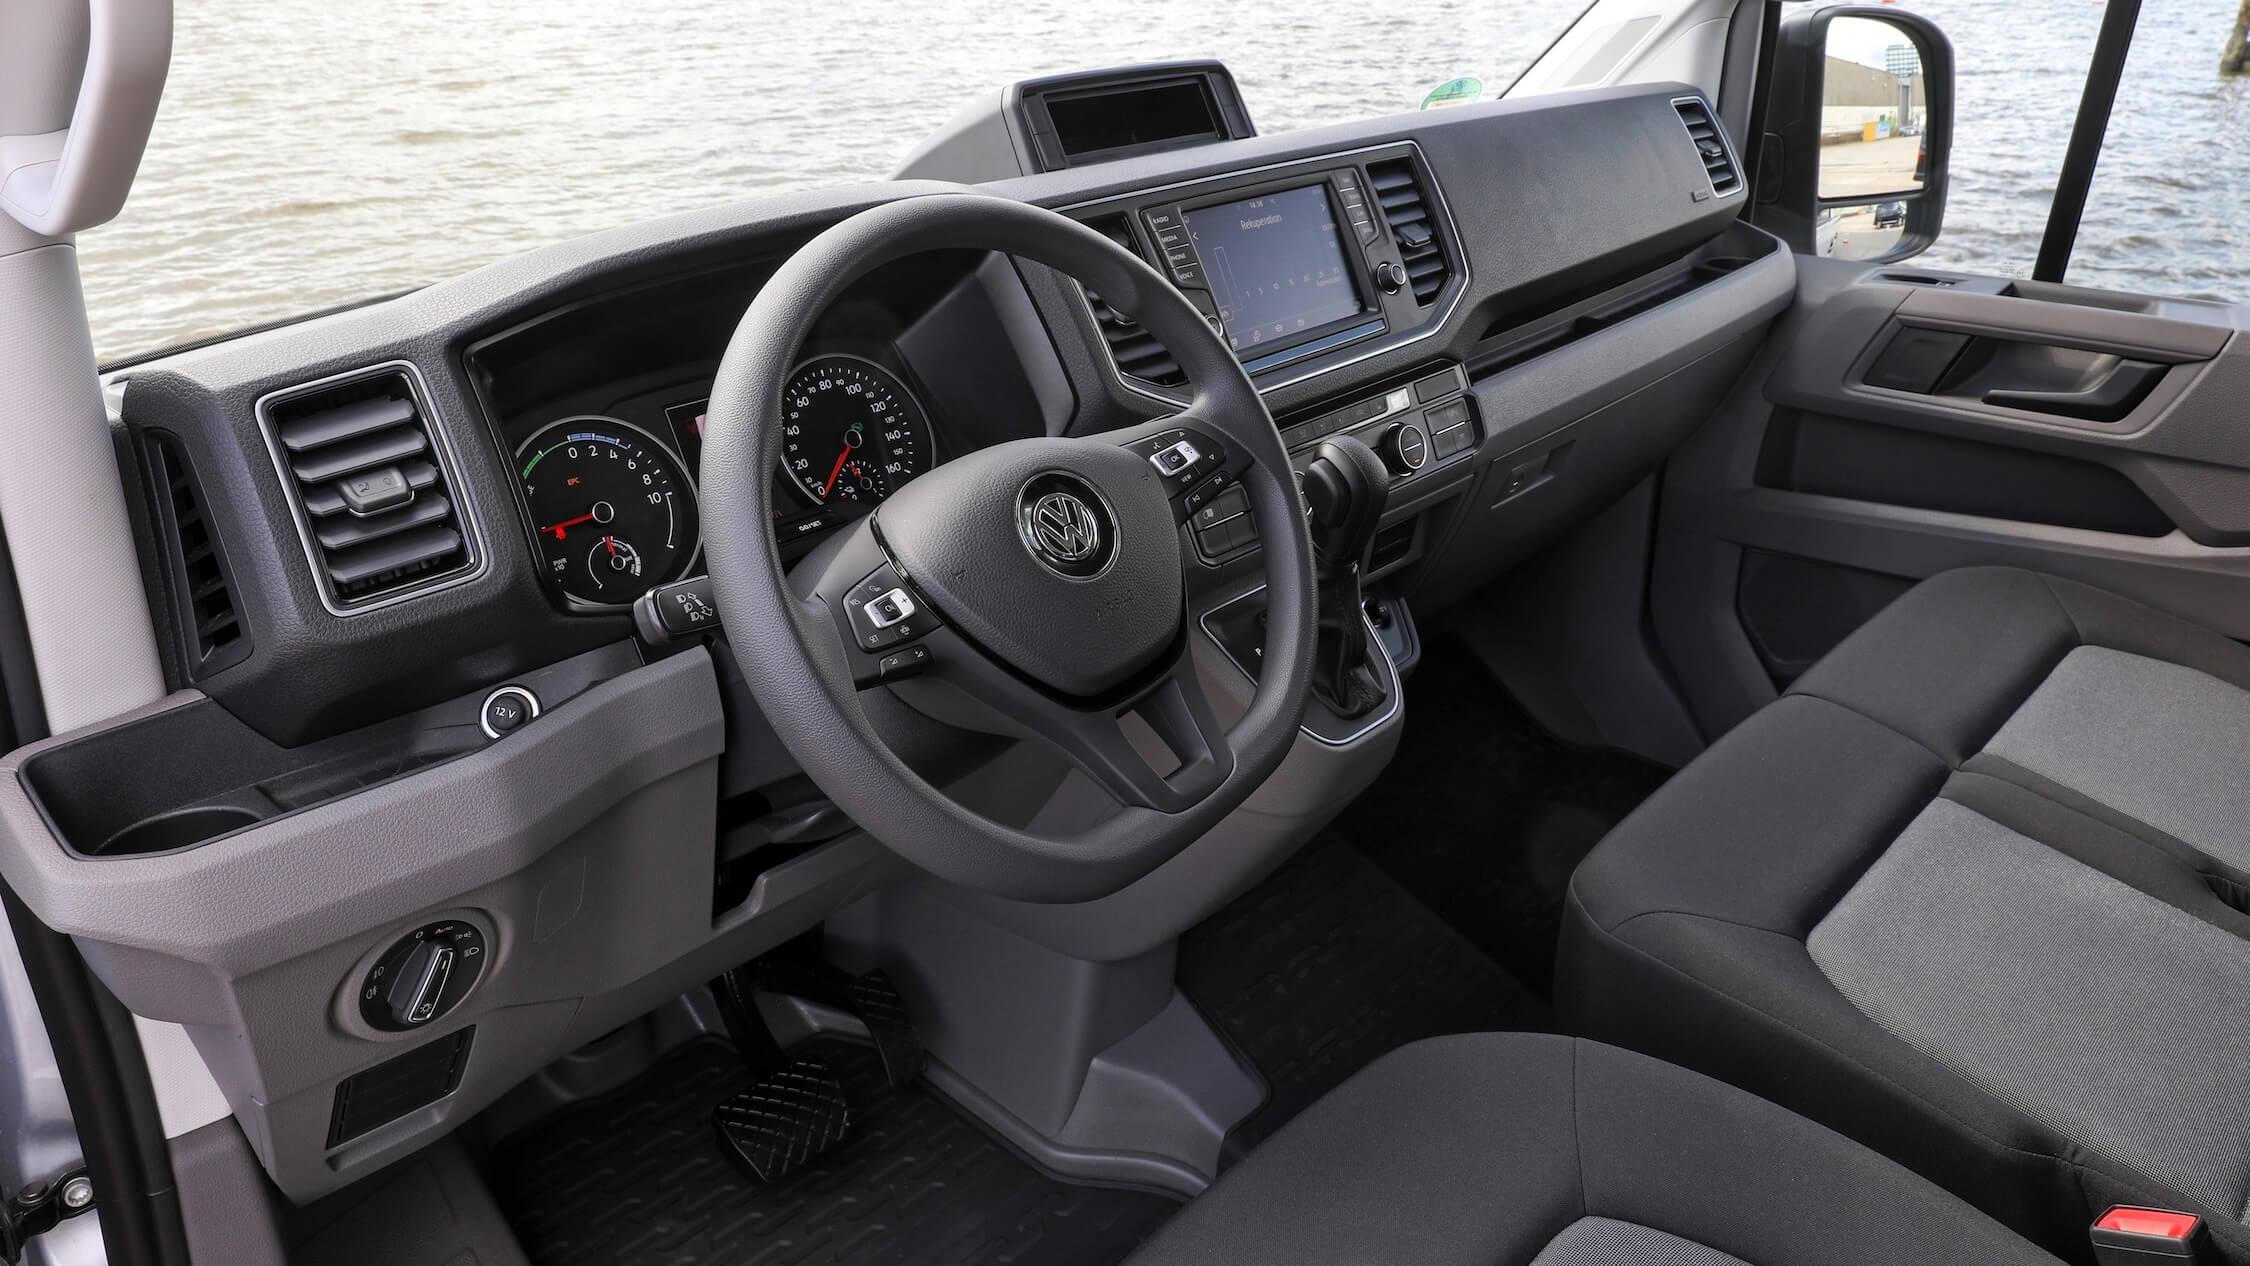 VW Crafter interieur